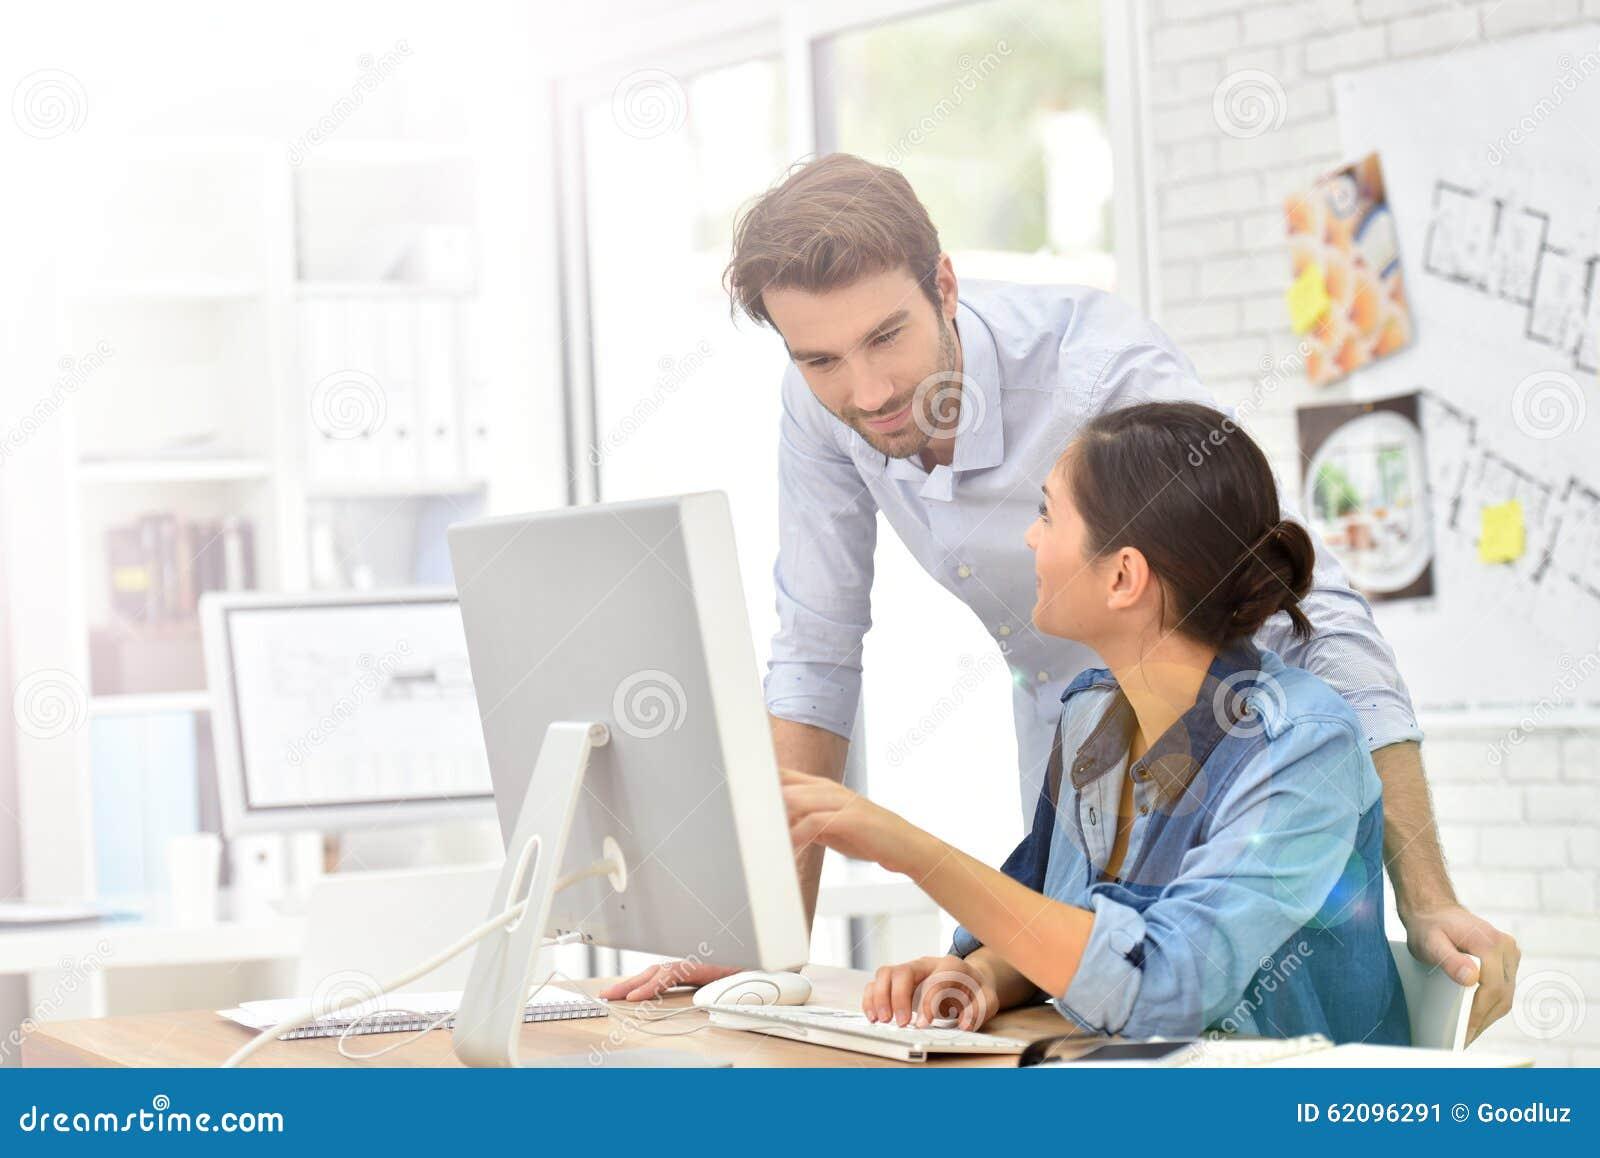 Business People Working Odesktop Computer Stock Photo ...